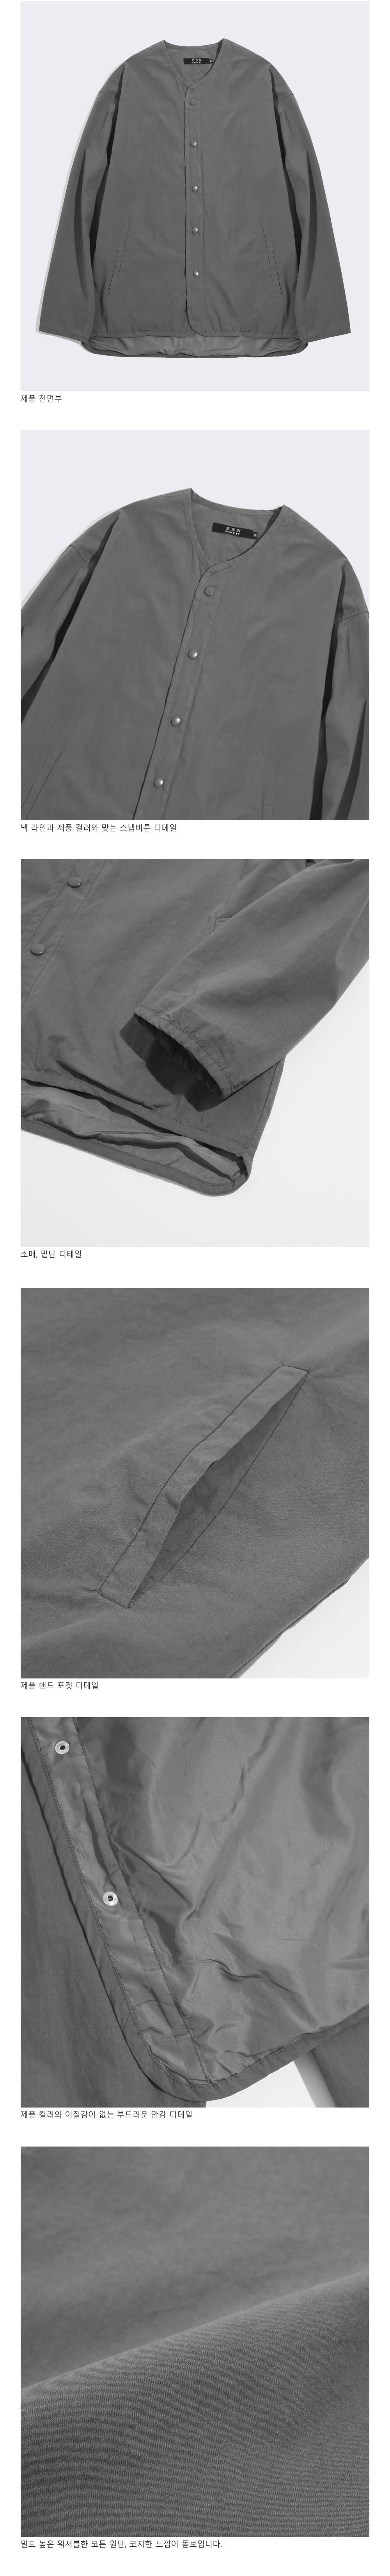 05_detail.jpg